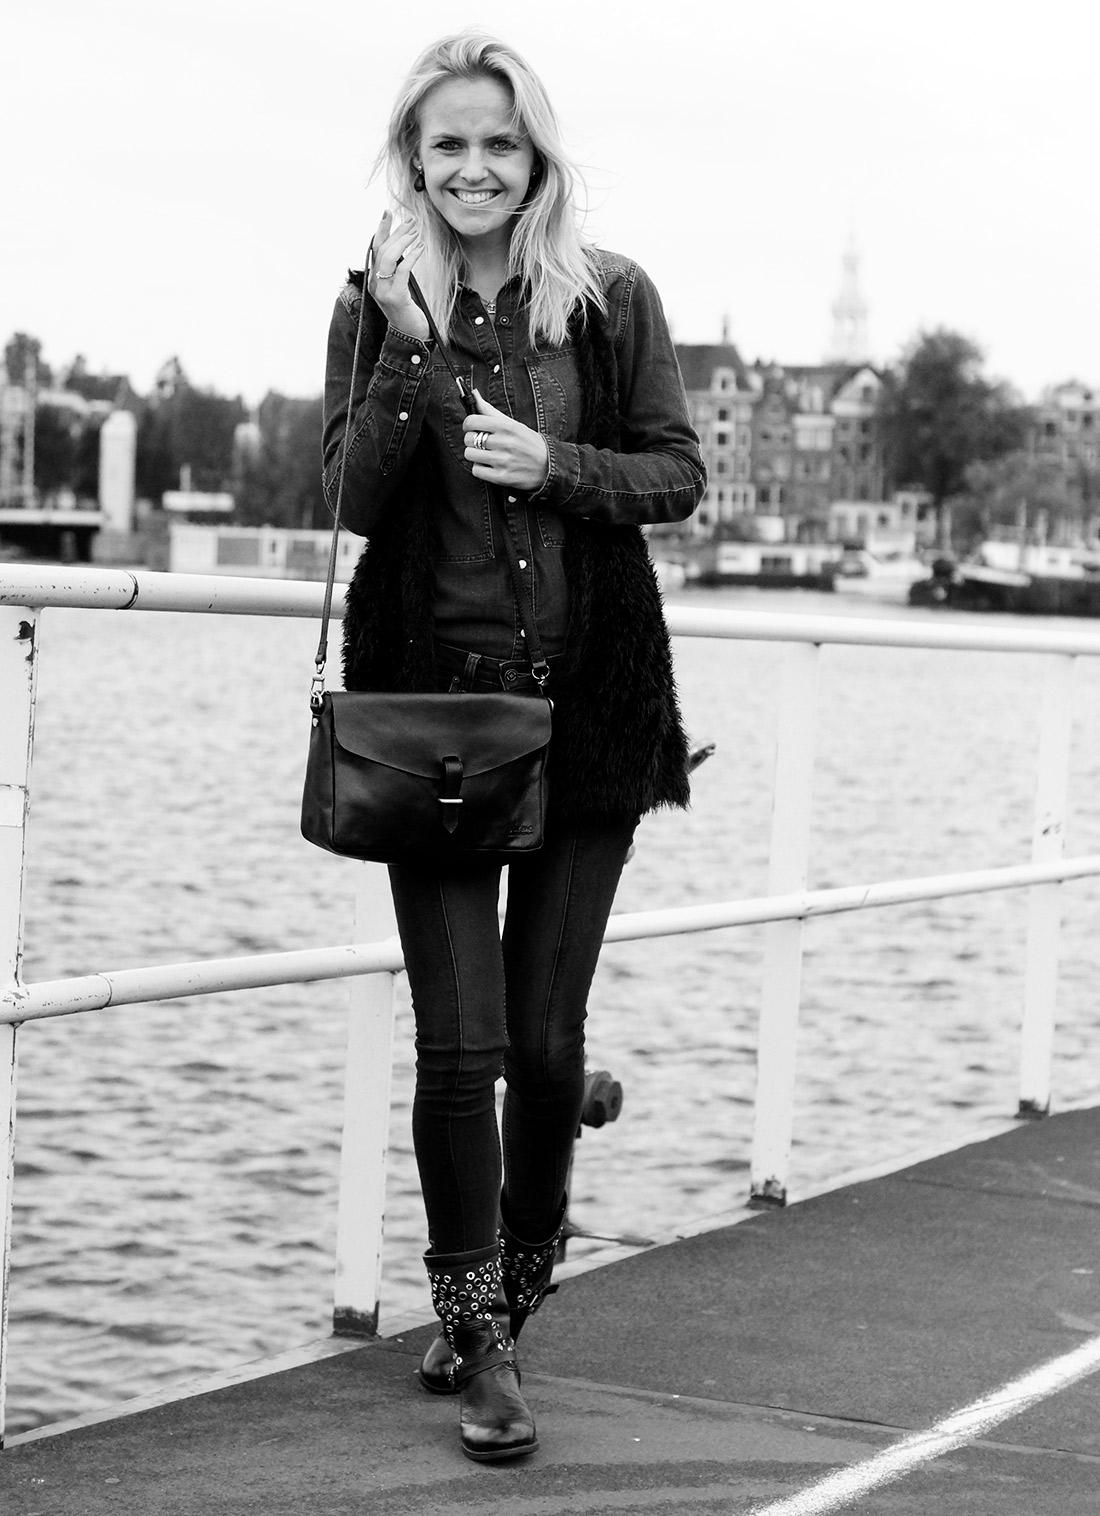 Bag-at-You---Fashion-blog---Lena-the-fashion-library---Denim-suit---O-My-Bag-bag---Black-boots